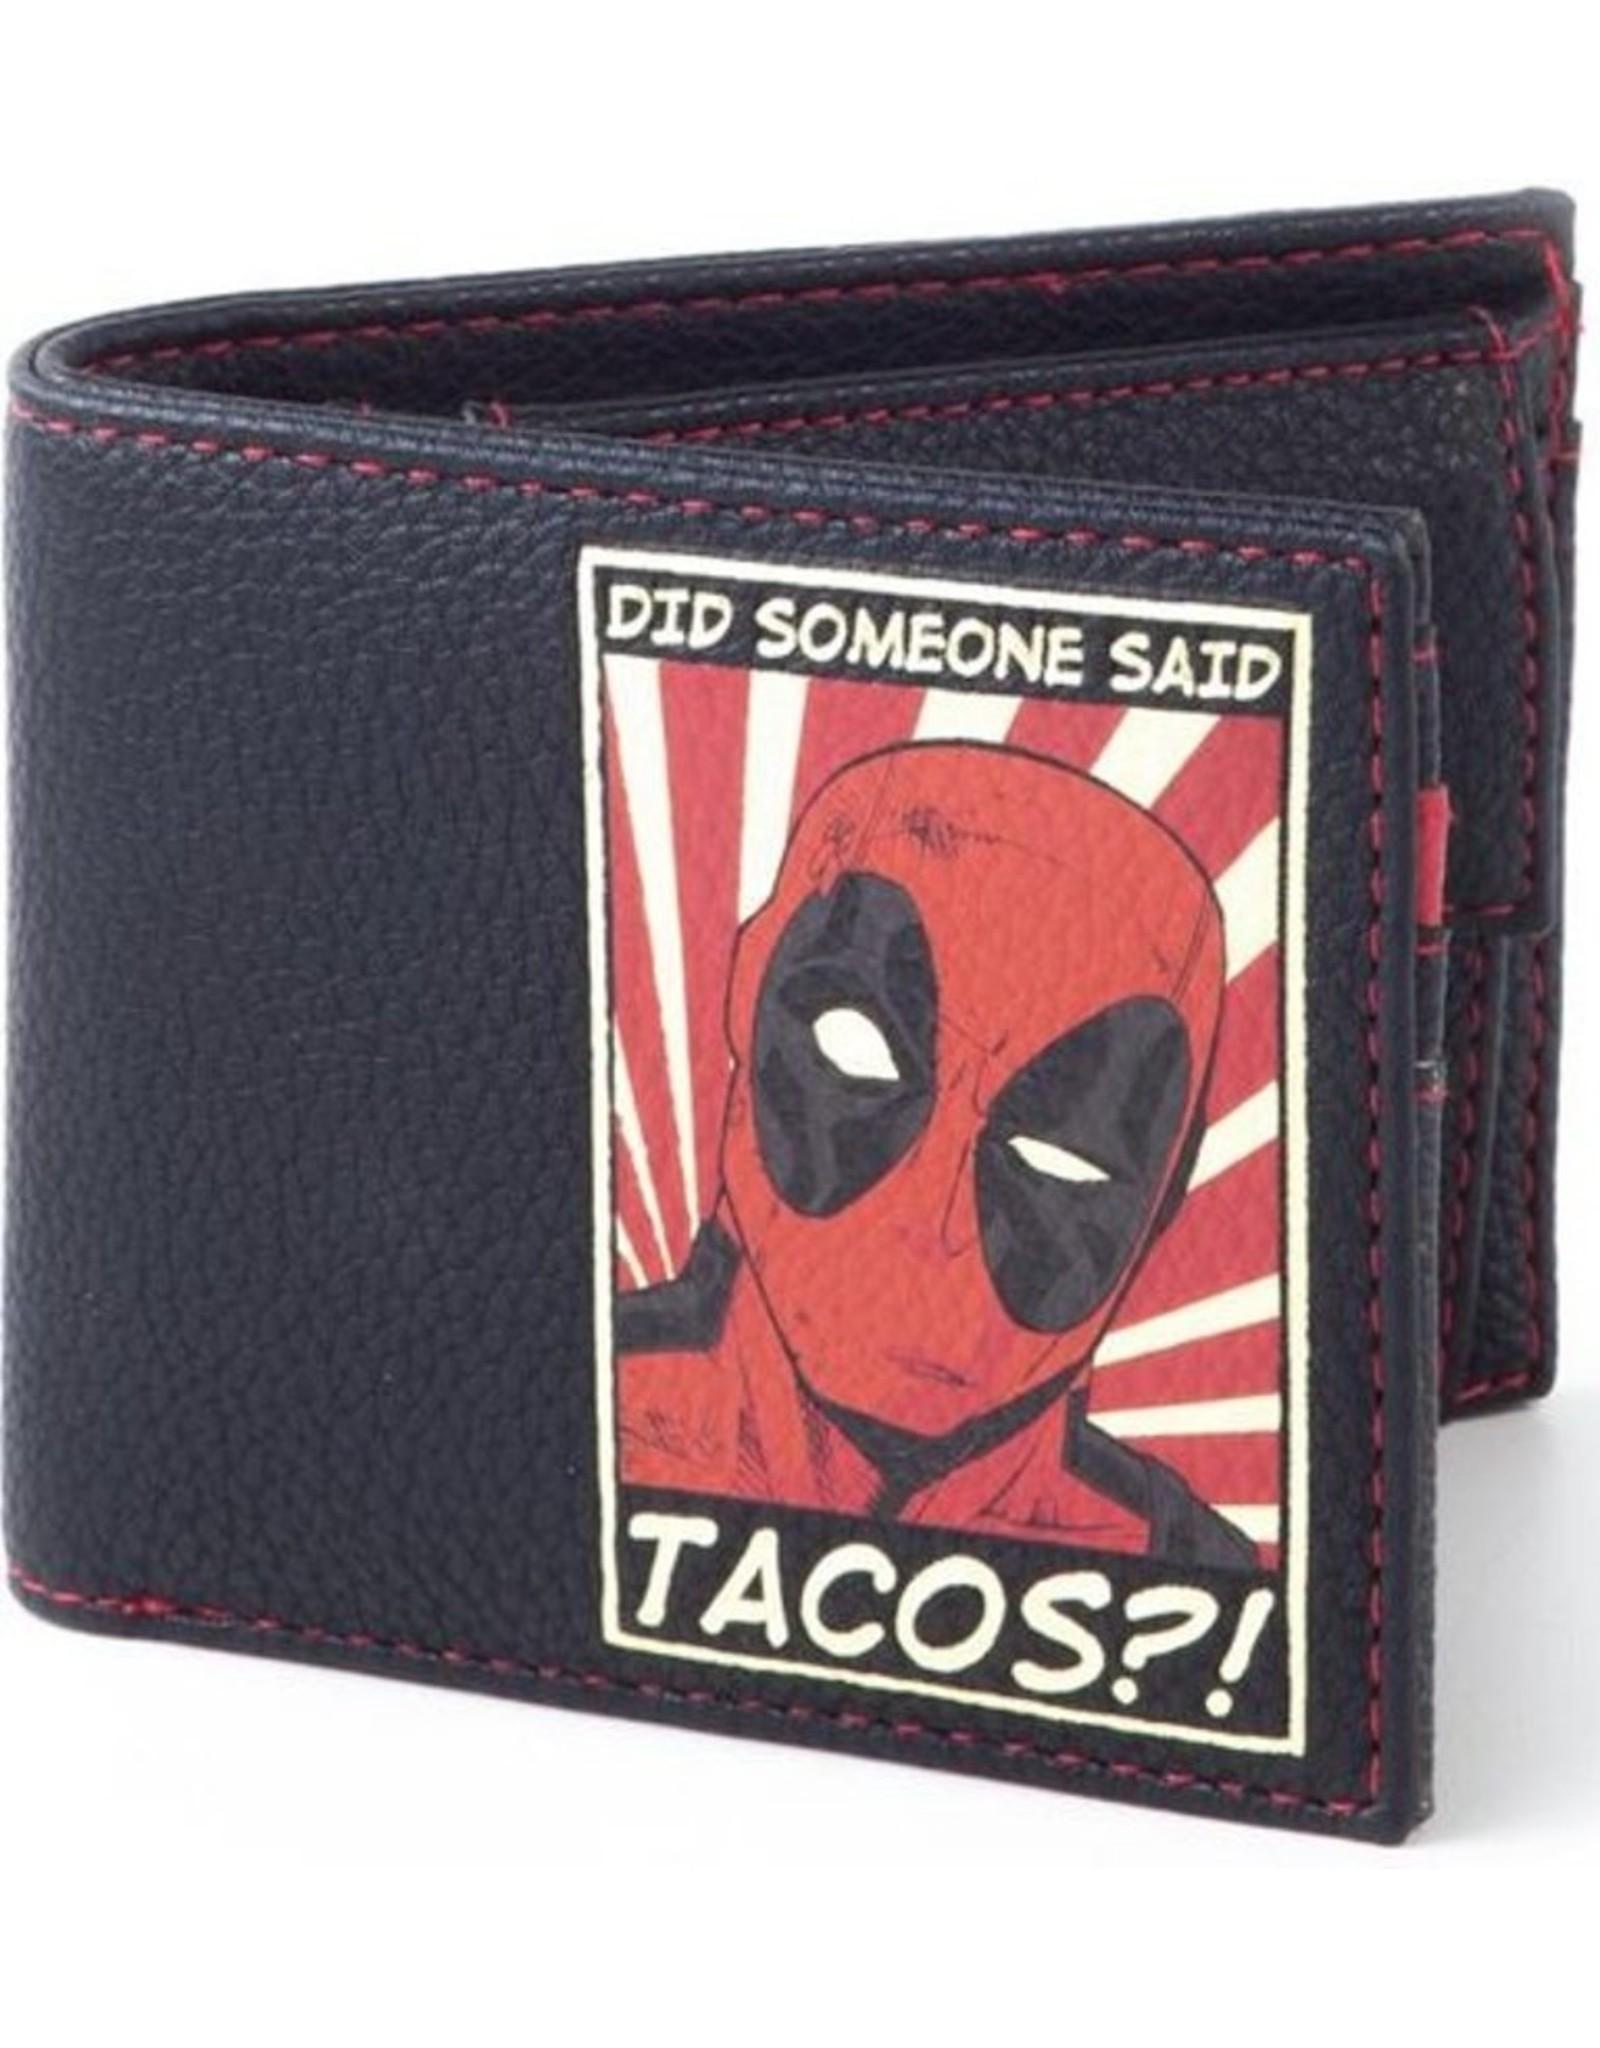 Difuzed Merchandise portemonnees -  Marvel Deadpool Tacos portemonnee